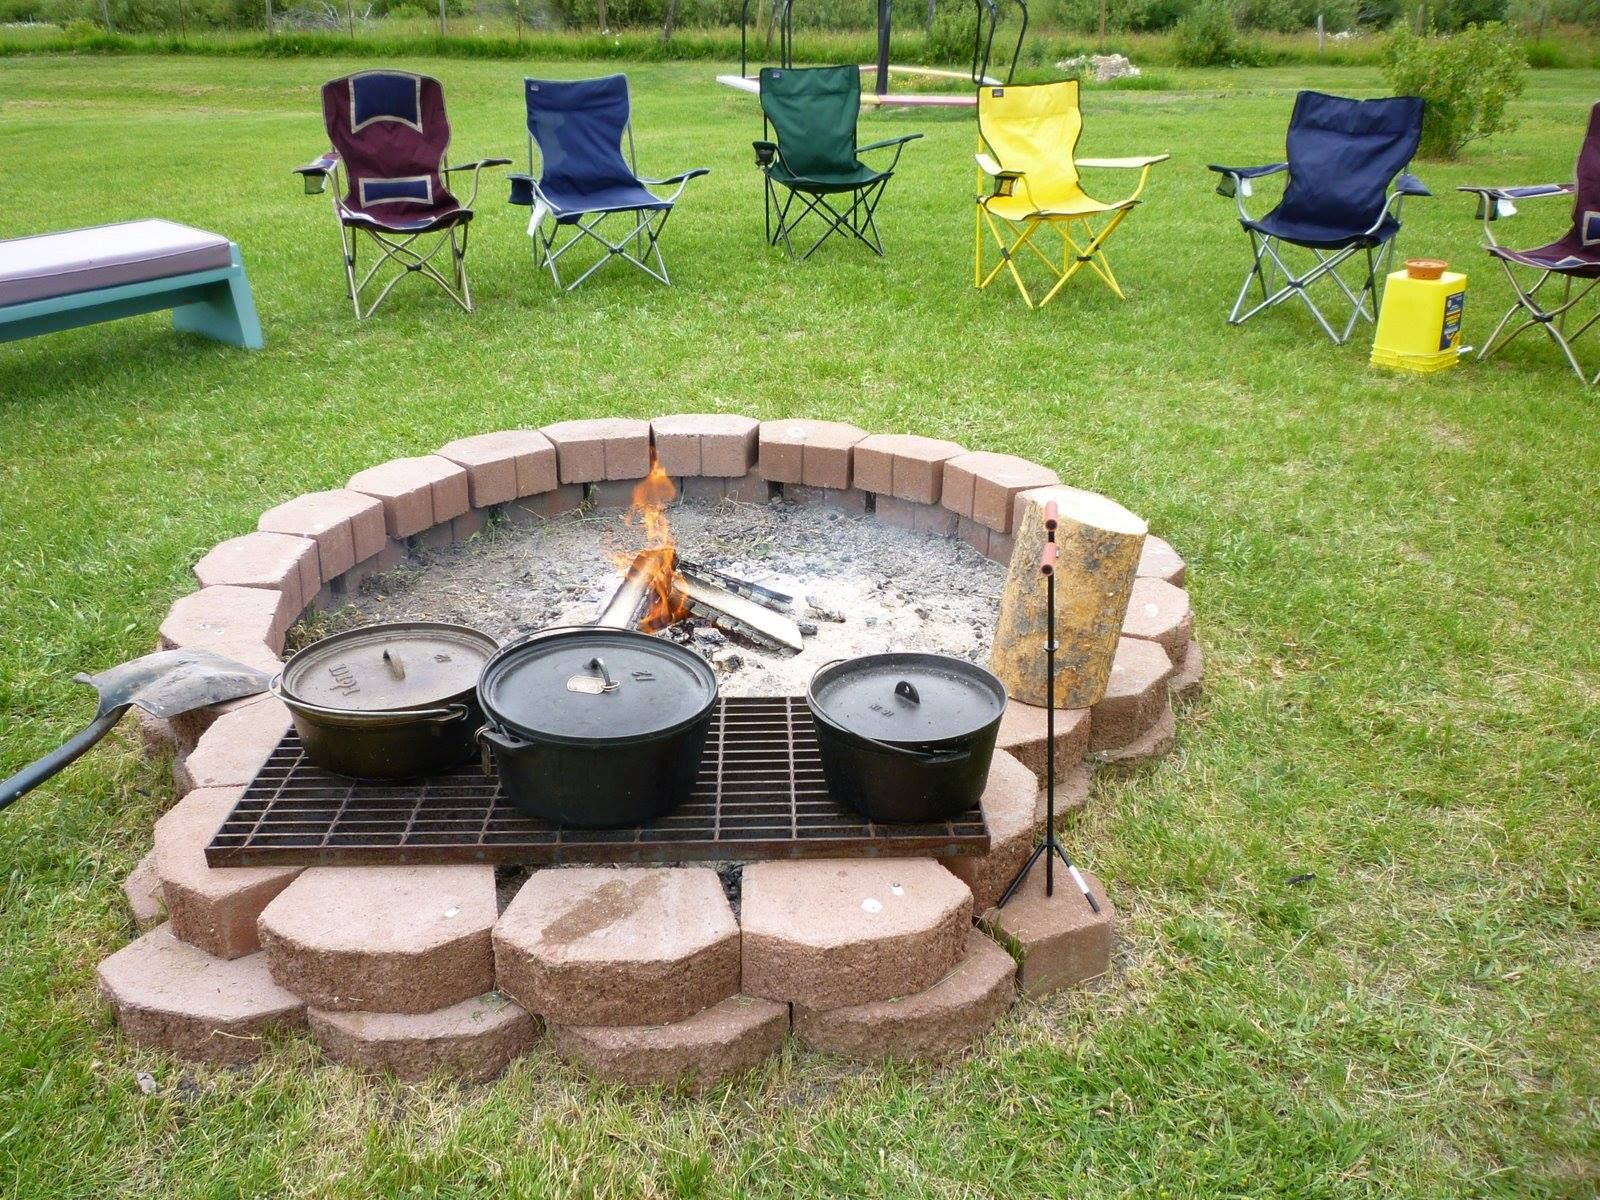 Outdoor Cooking Idea Fire Pit Backyard Backyard Fire Fire Pit